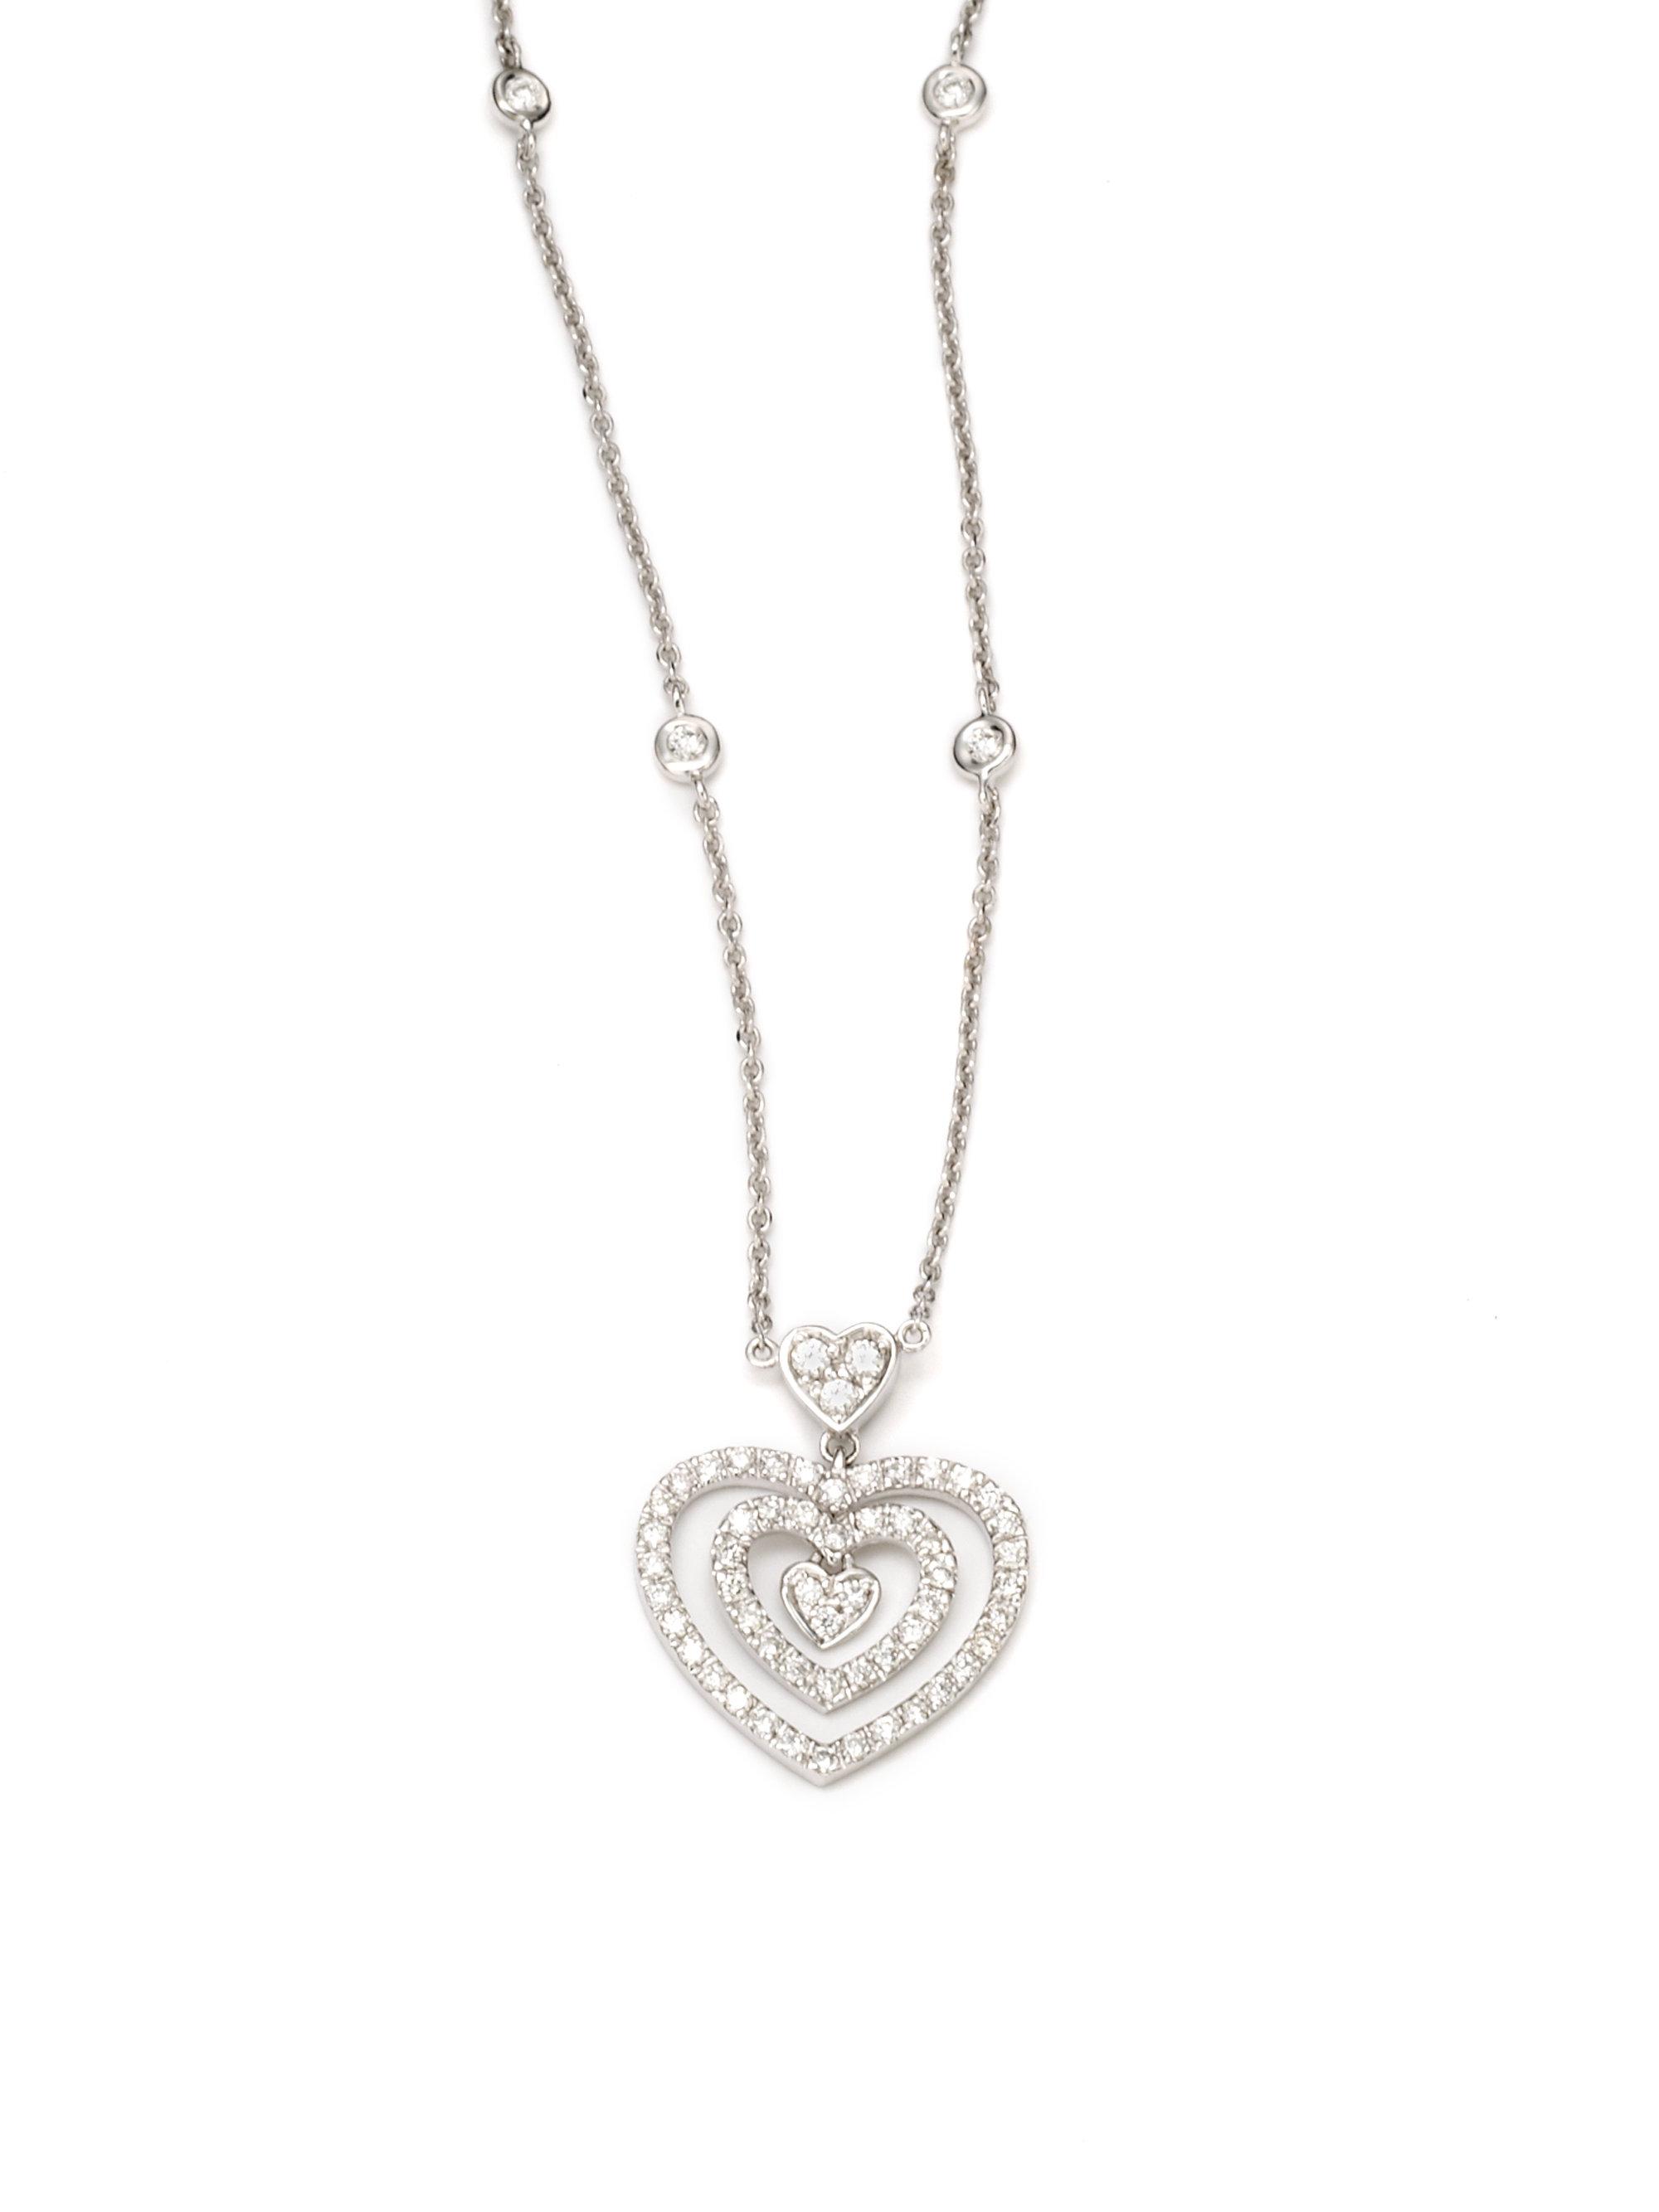 Kc designs Diamond Heart Pendant Necklace in Metallic